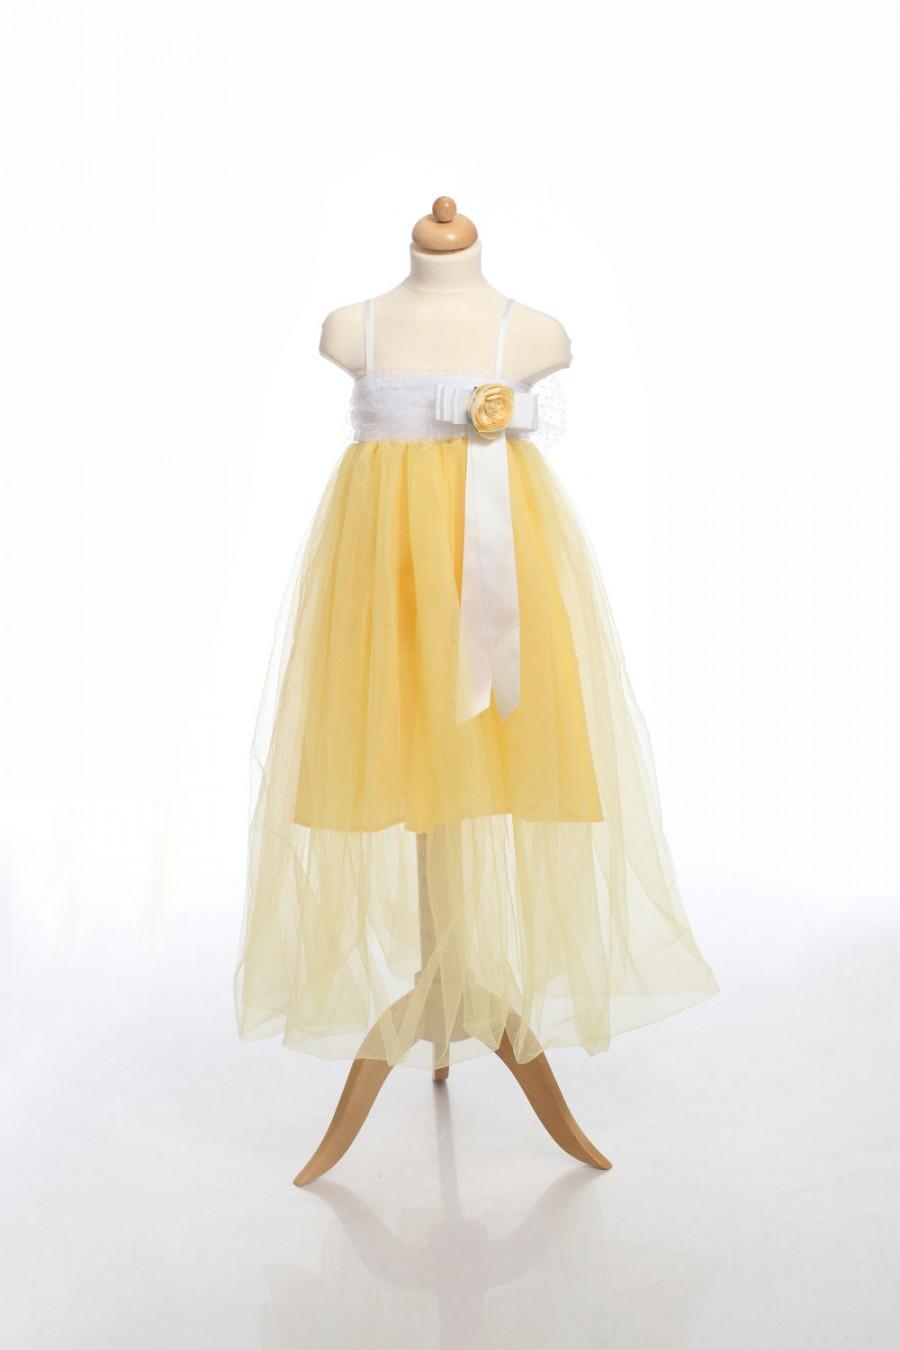 Mariage - Tutu Flower Girl Dress,Belle princess dress, Yellow Girl Dress, Yellow and White Tulle with Yellow flower and ribbon toddler dress, Fairy